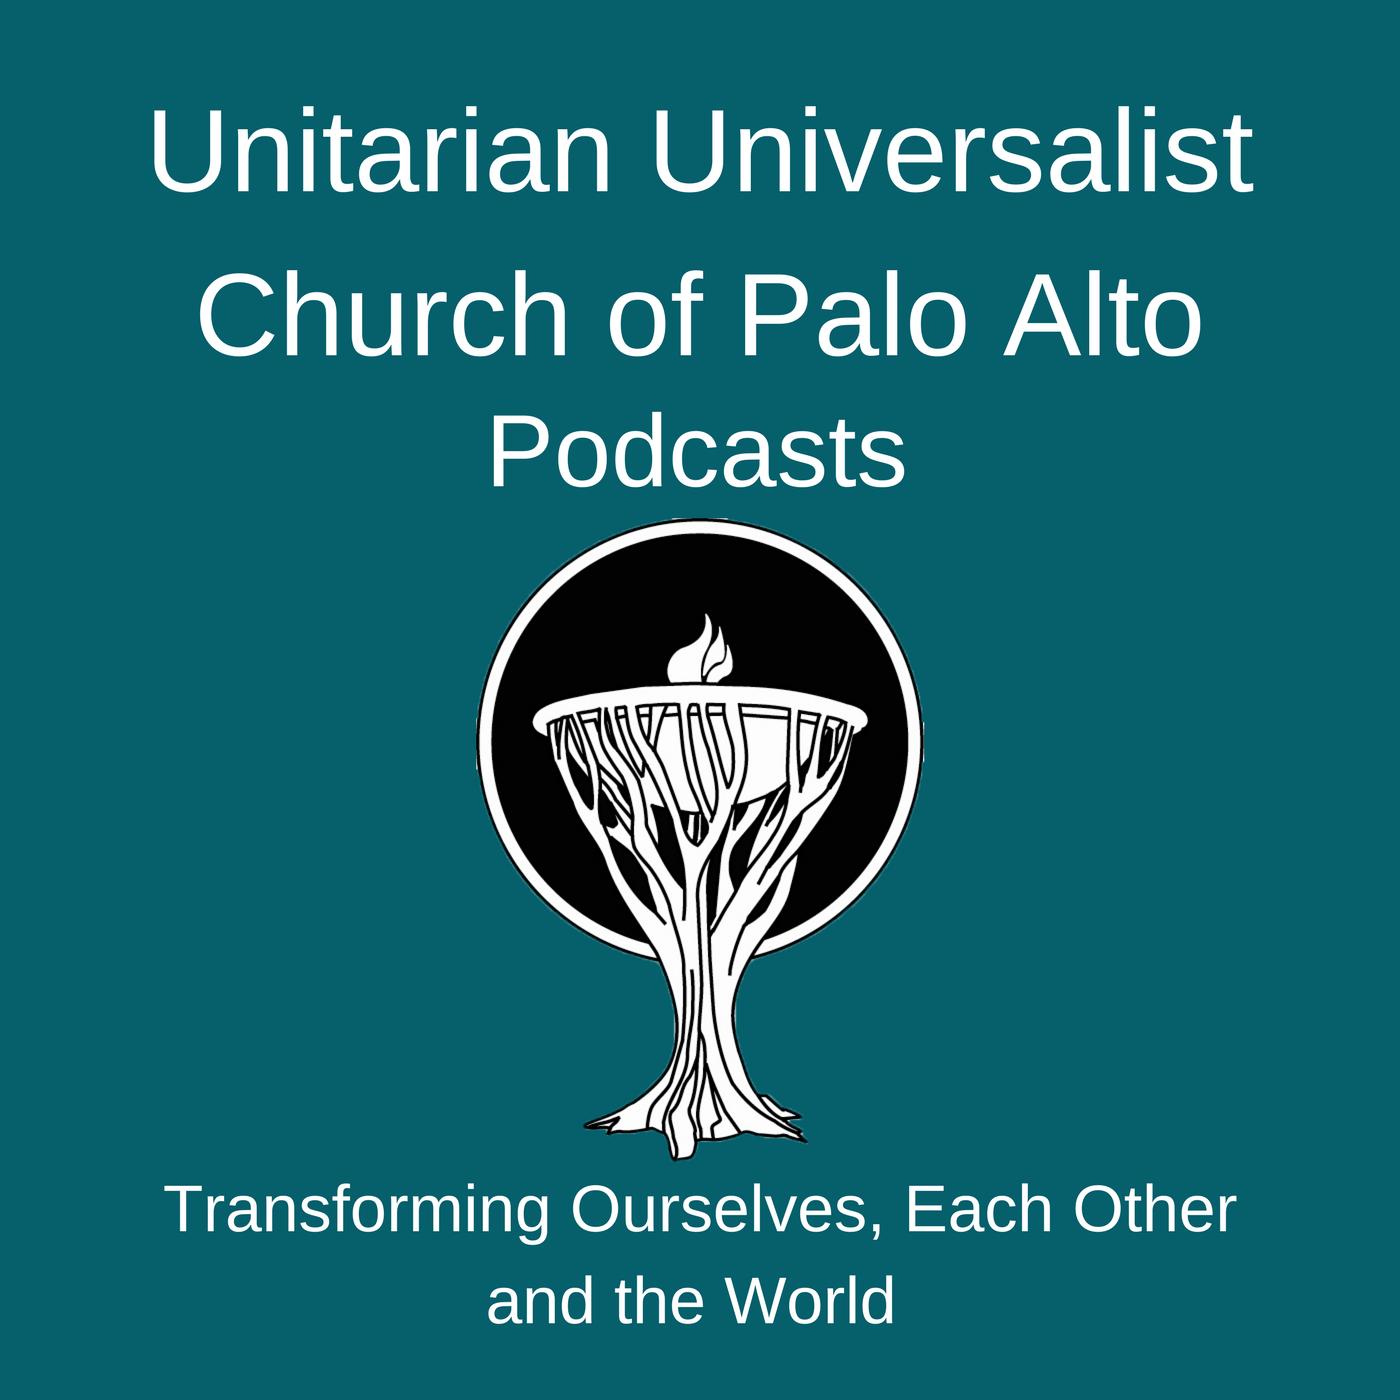 Unitarian Universalist Church of Palo Alto Sermons and Reflections